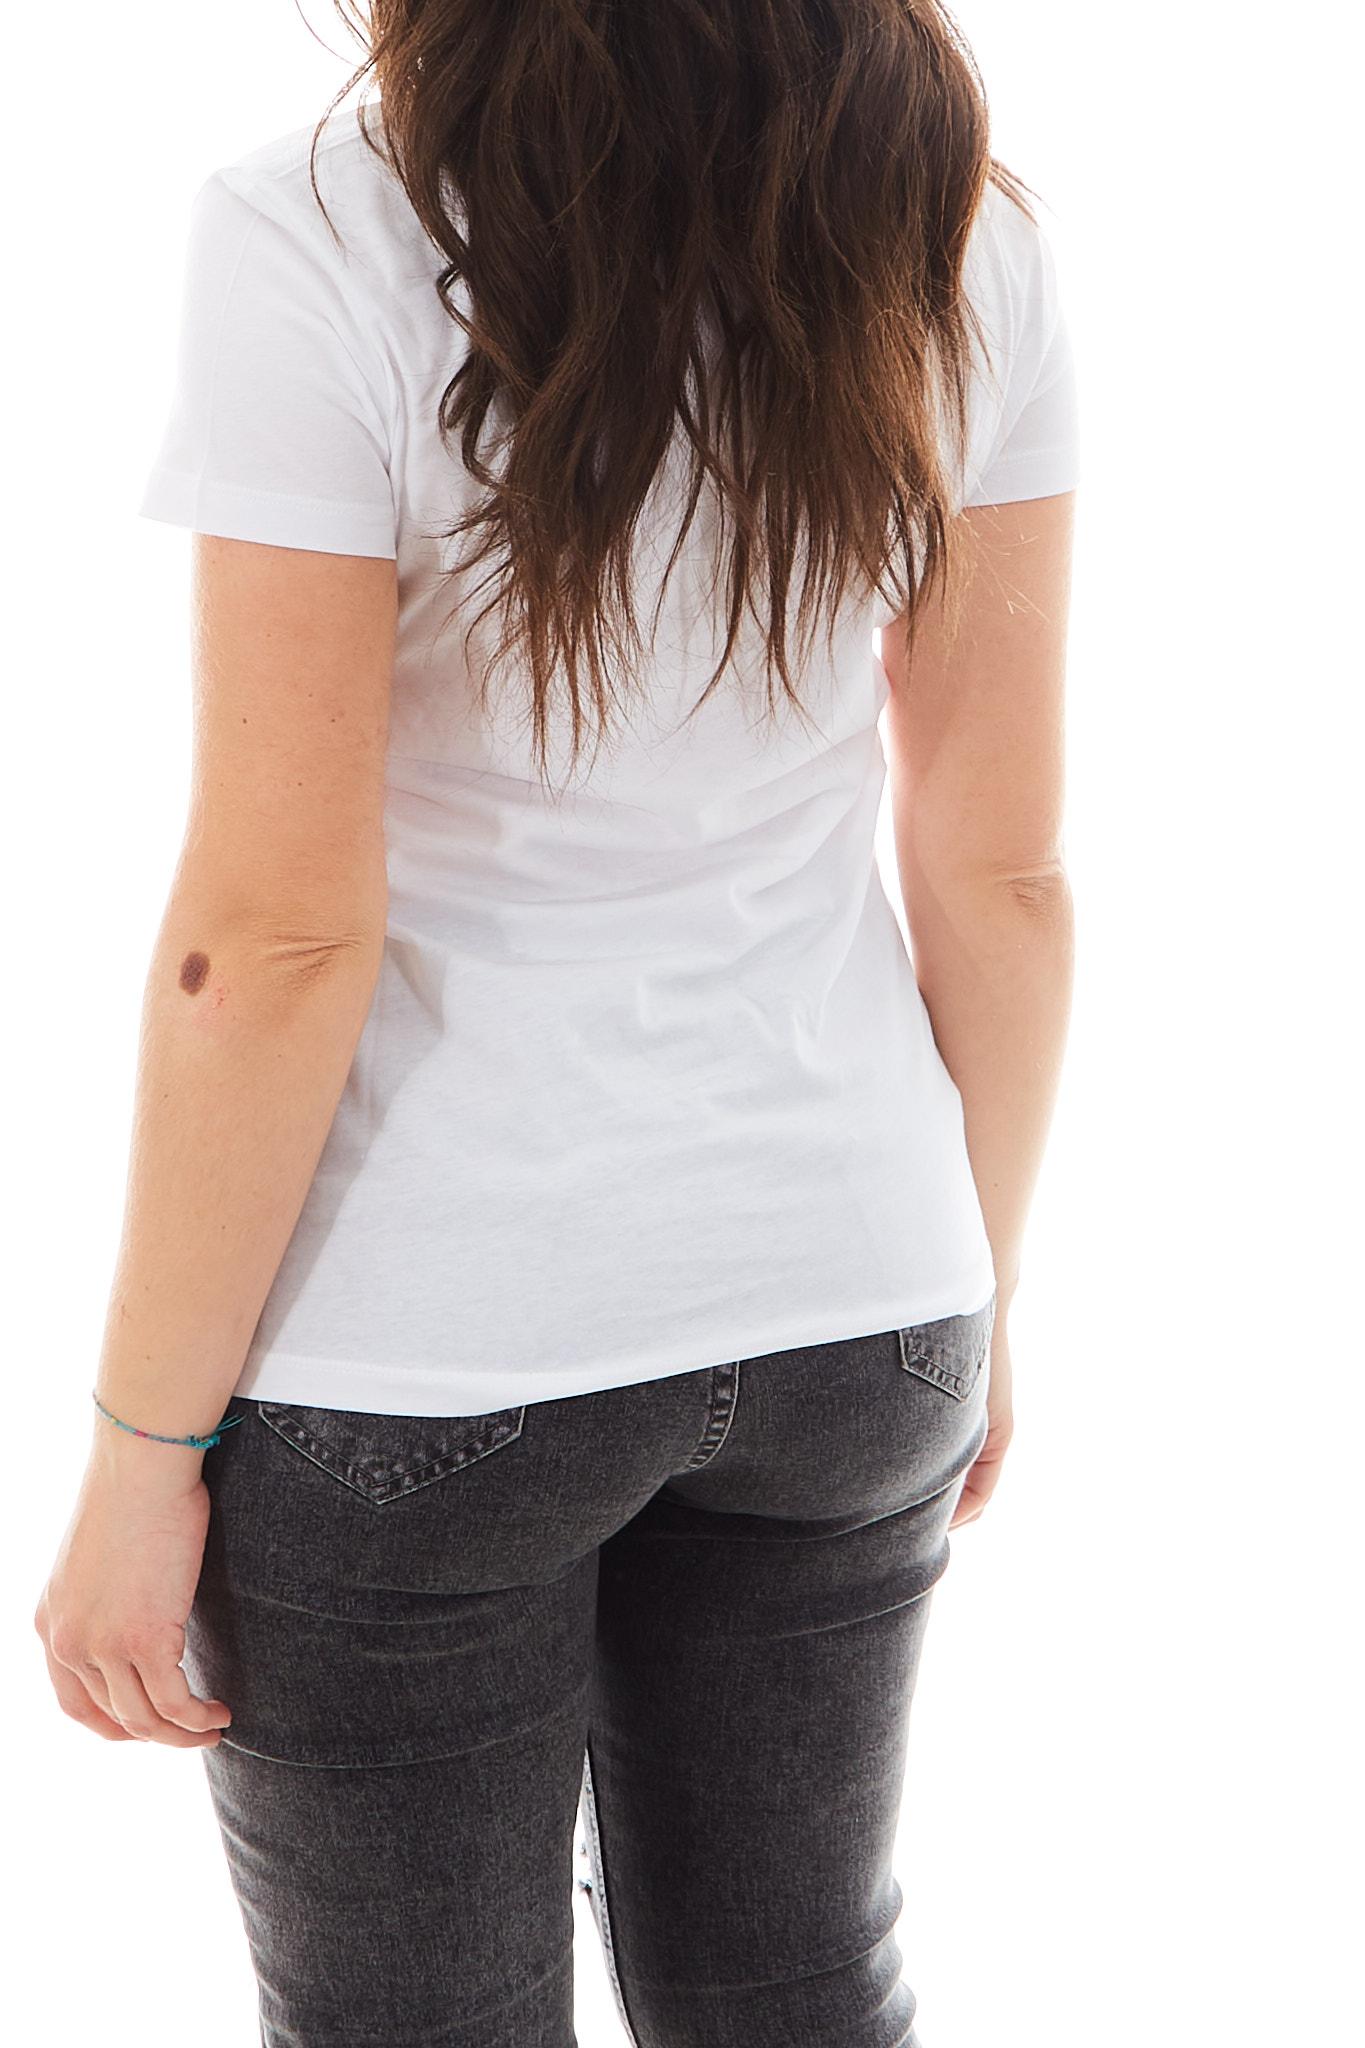 T-shirt Patrizia Pepe PATRIZIA PEPE | T-shirt | 8M1209-A8U9XU67